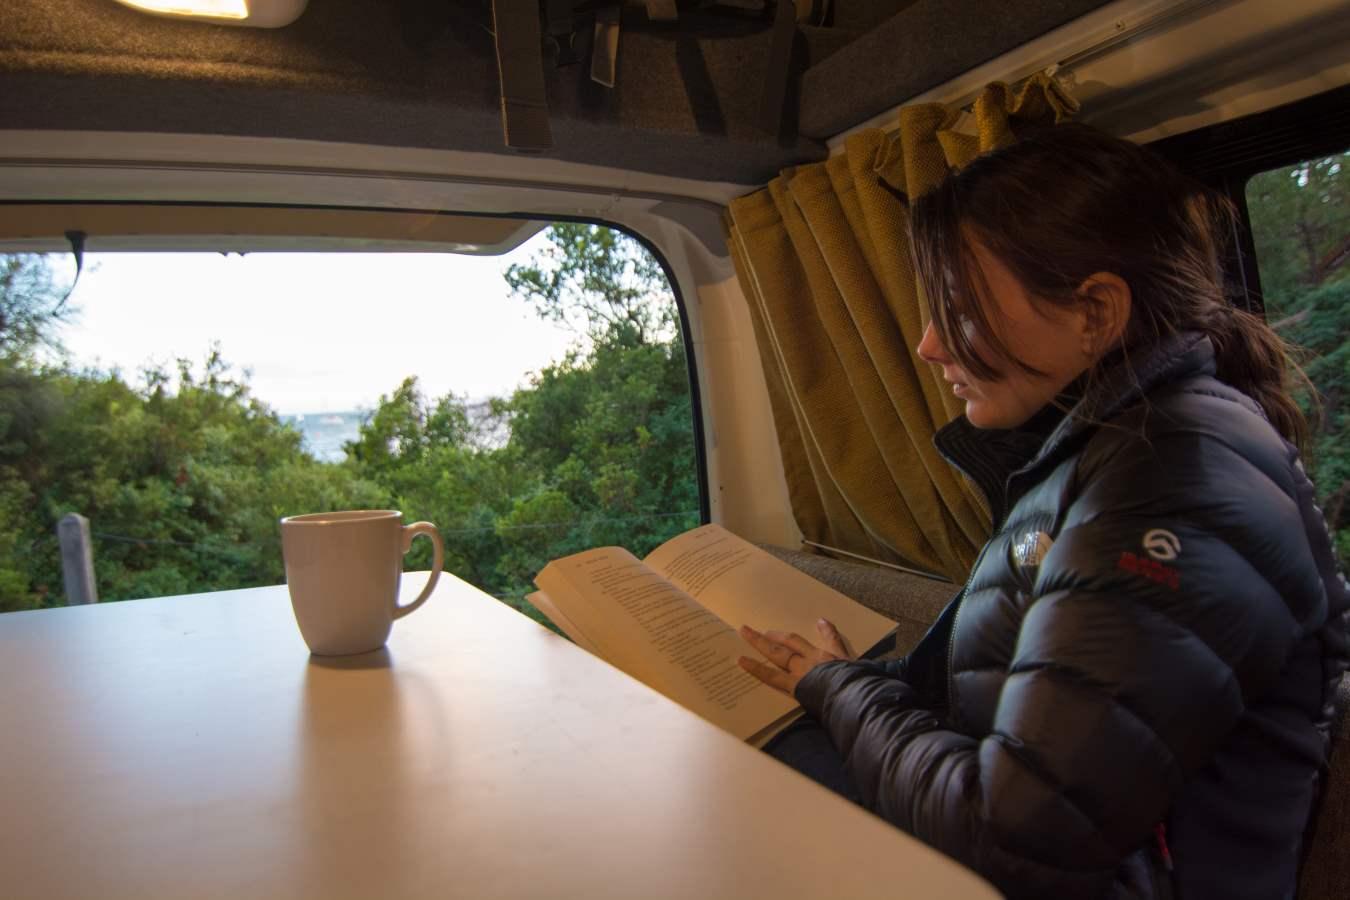 Woman Reading a Book - RV Hire Canberra - Campervan Rental Shop